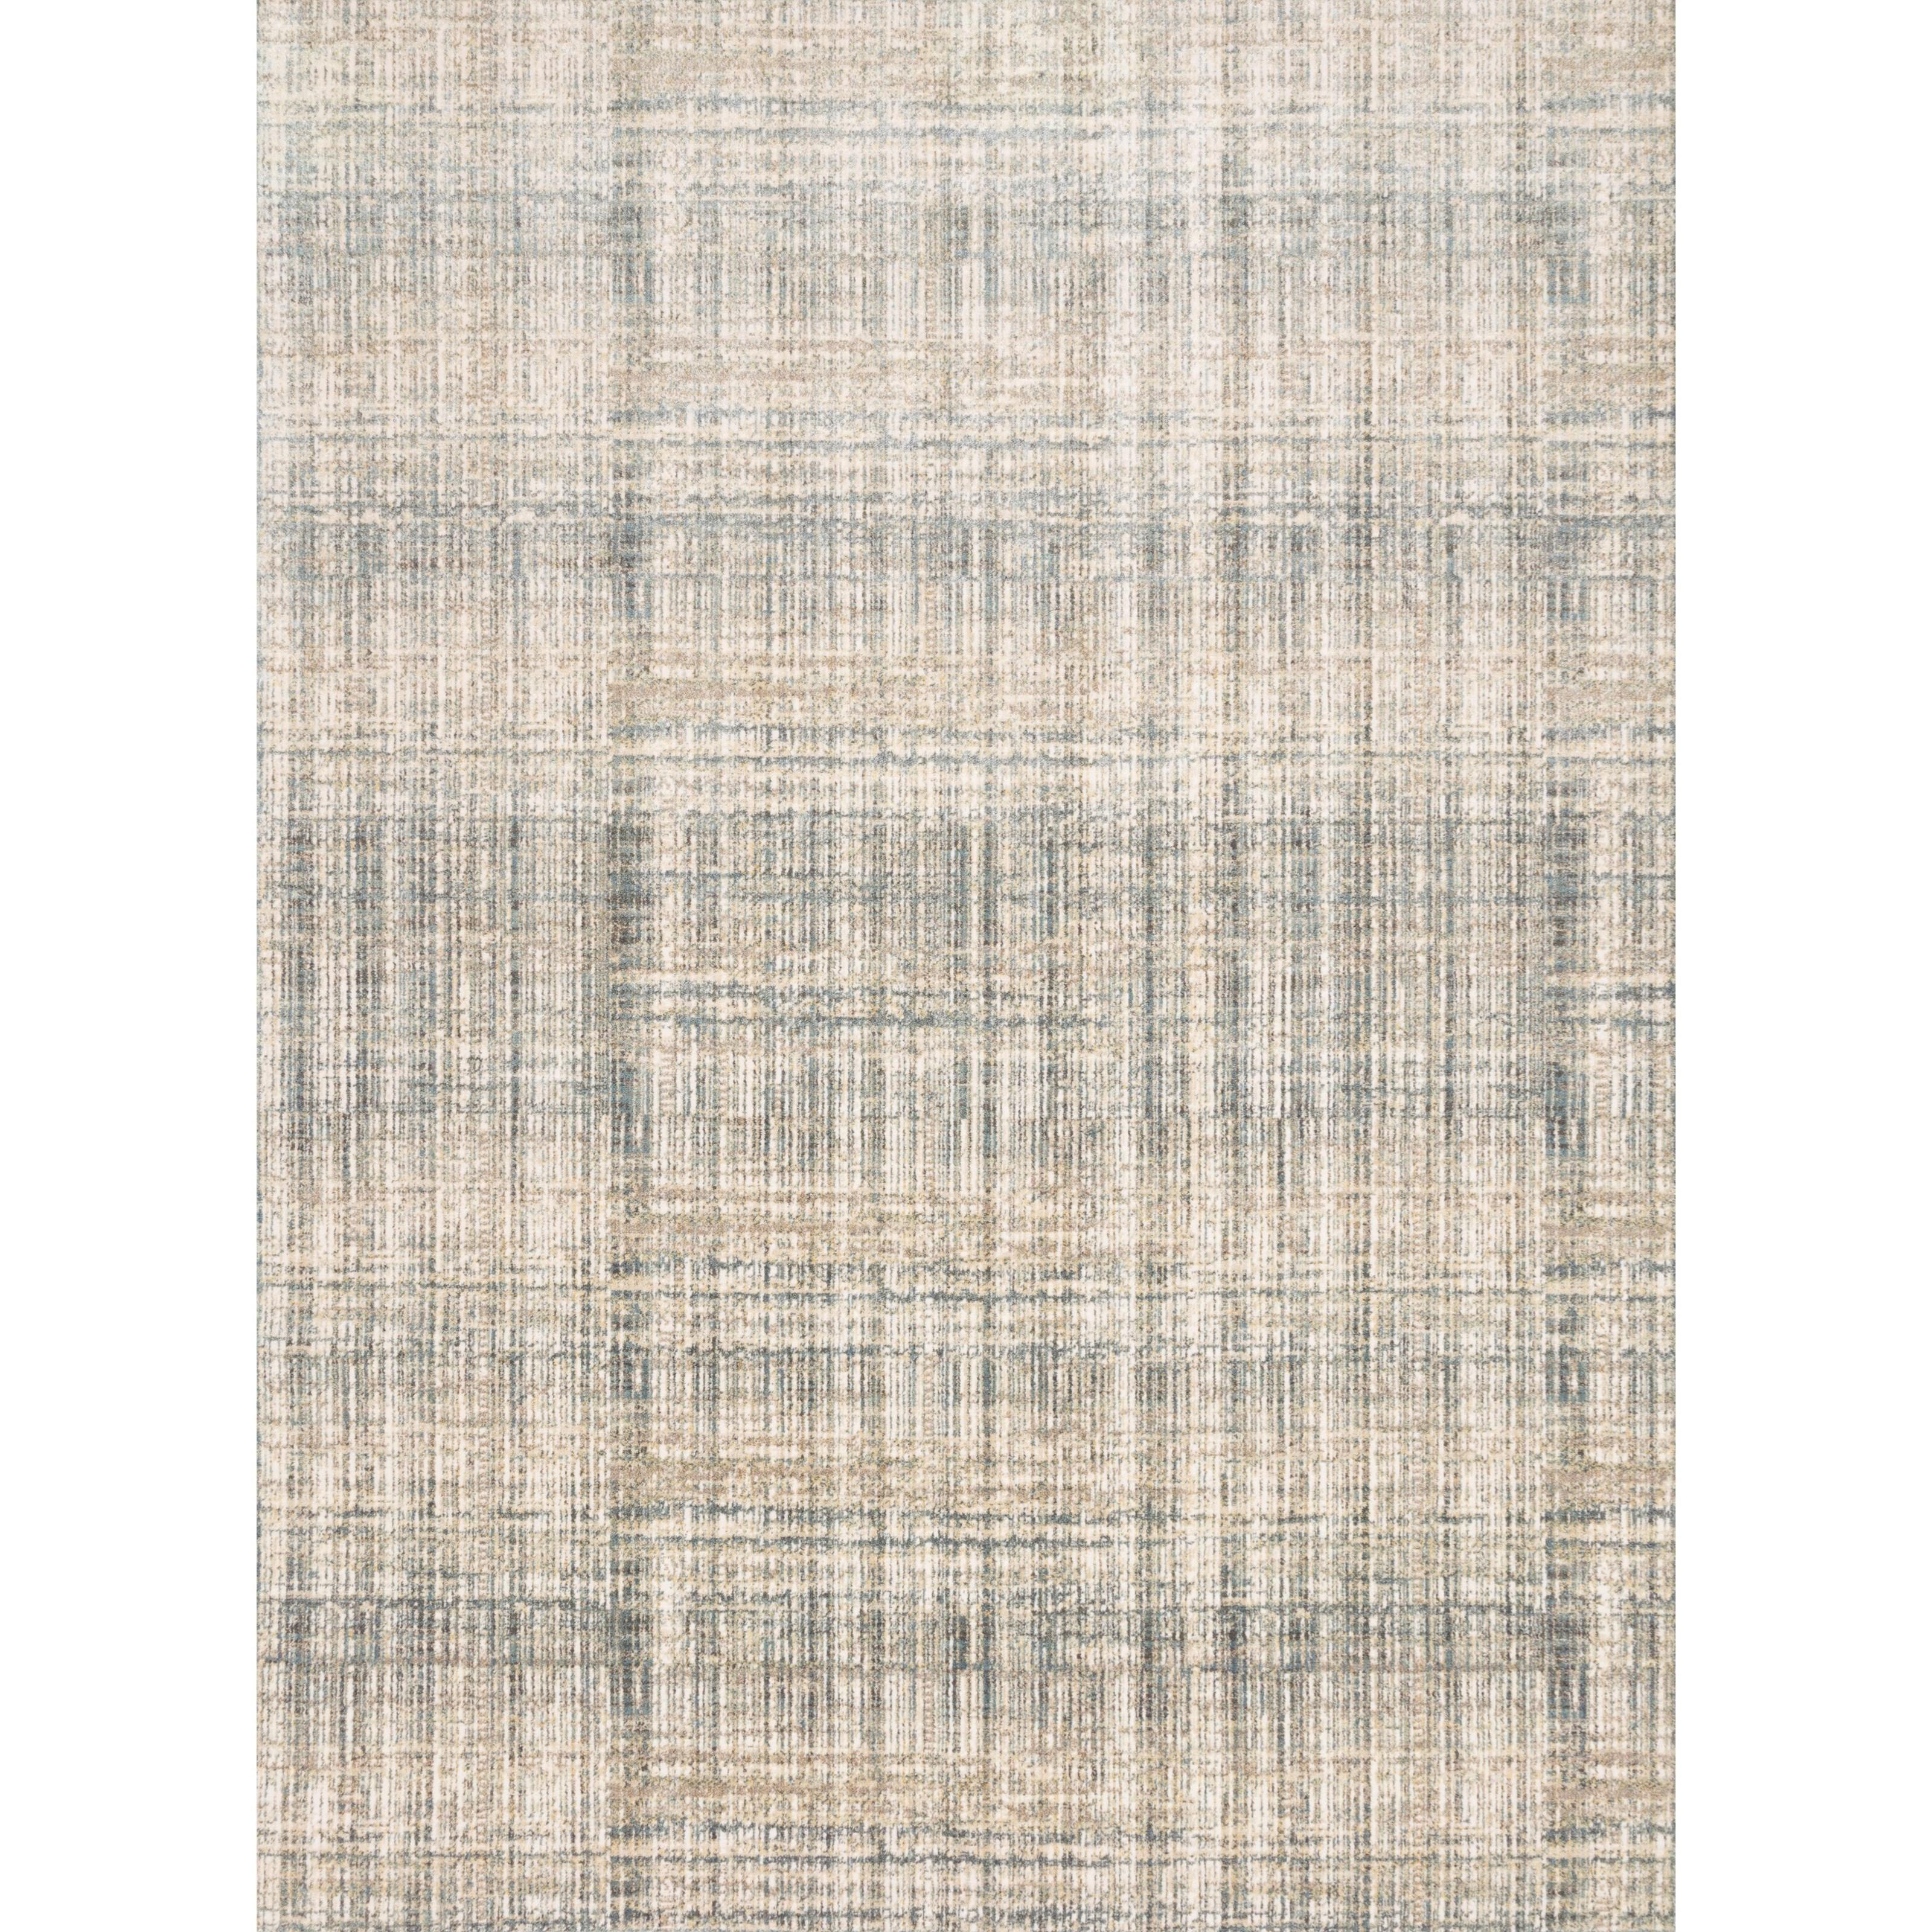 "Reid 2'7"" x 8'0"" Bluestone Rug by Loloi Rugs at Virginia Furniture Market"